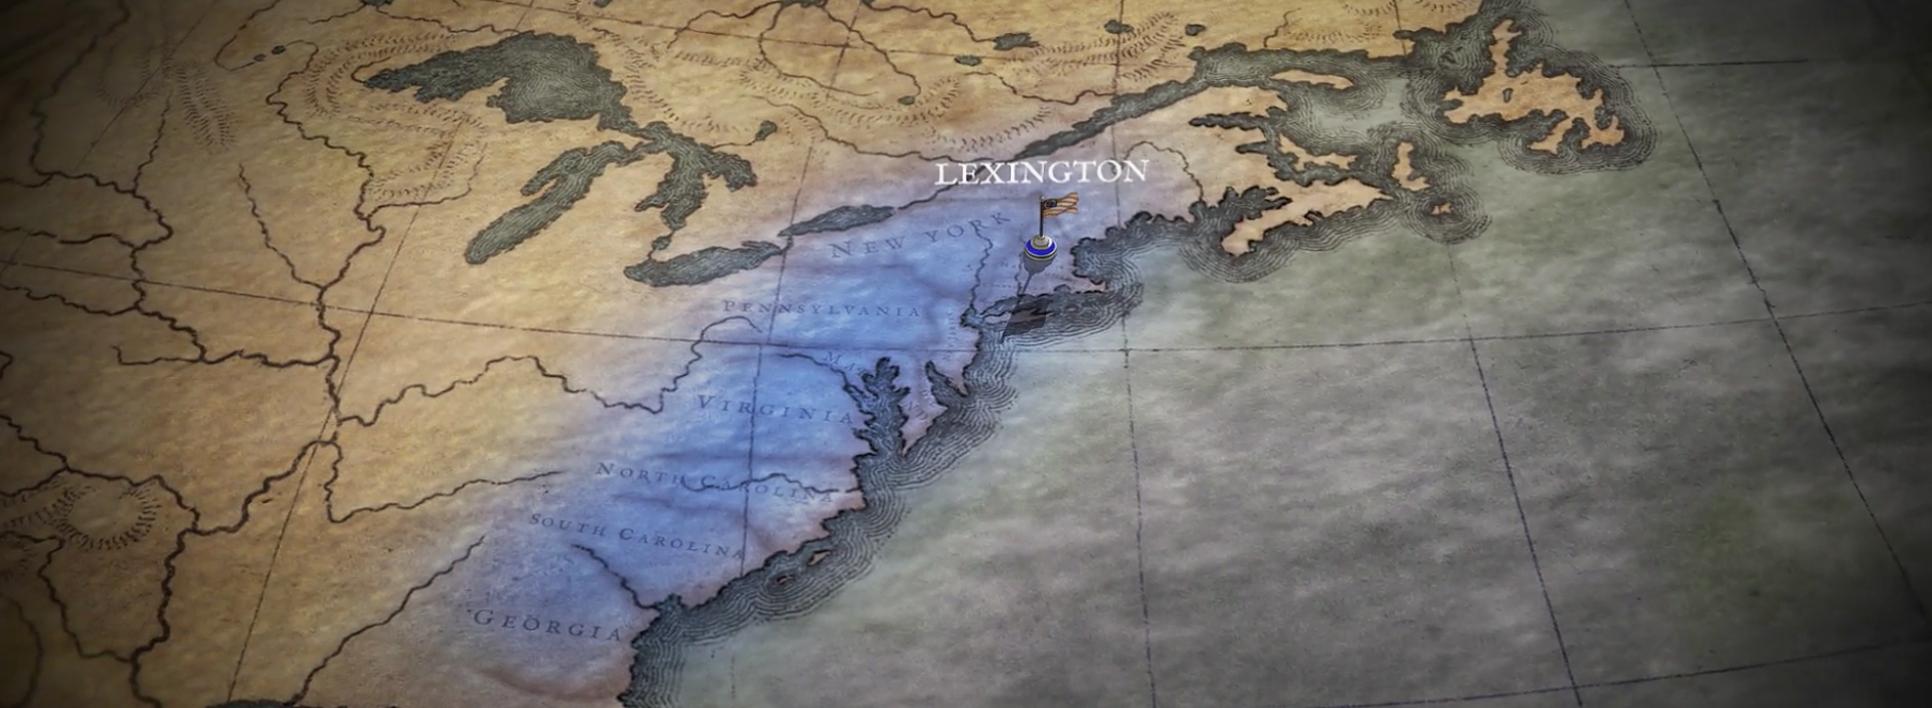 The Revolutionary War Animated Map | American Battlefield Trust